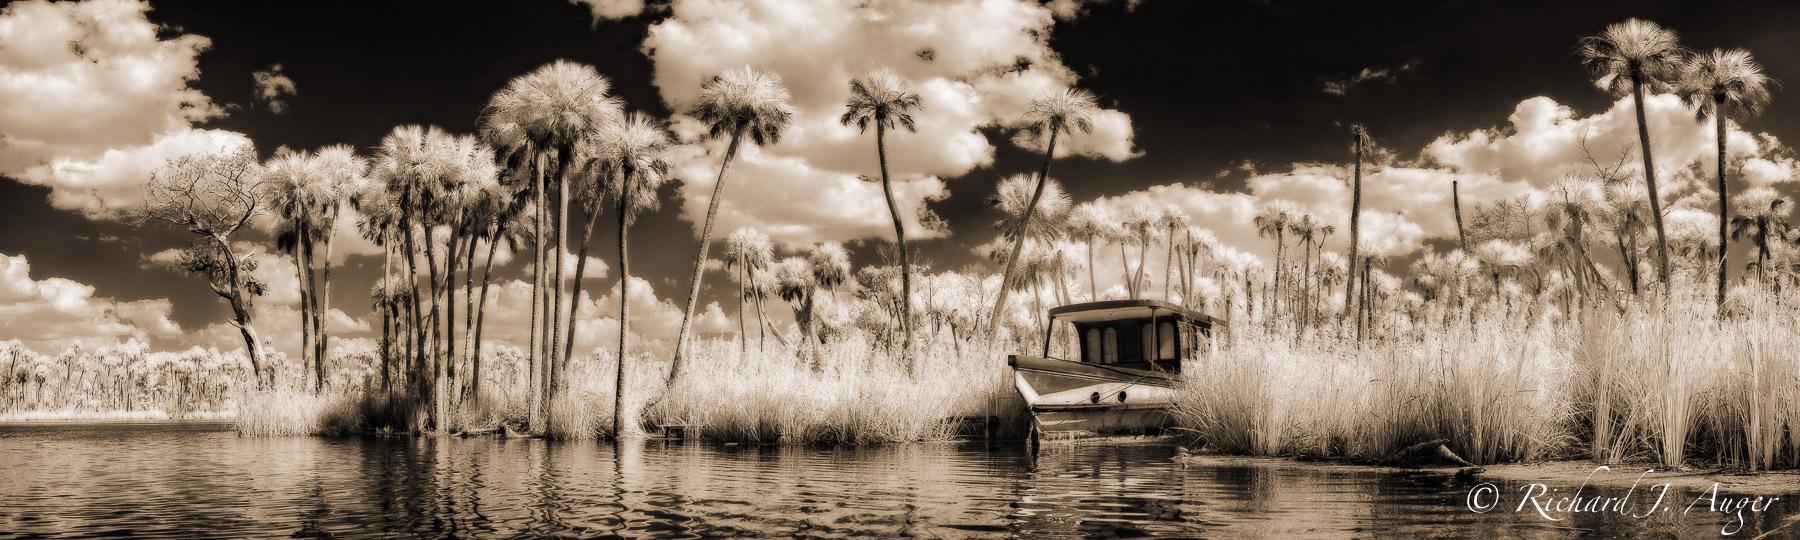 Chassahowitzka river, Florida, Chaz, boat, swamp, palm trees, coastal, storm, water, landscape, photographer, sepia tone, black and white, panorama